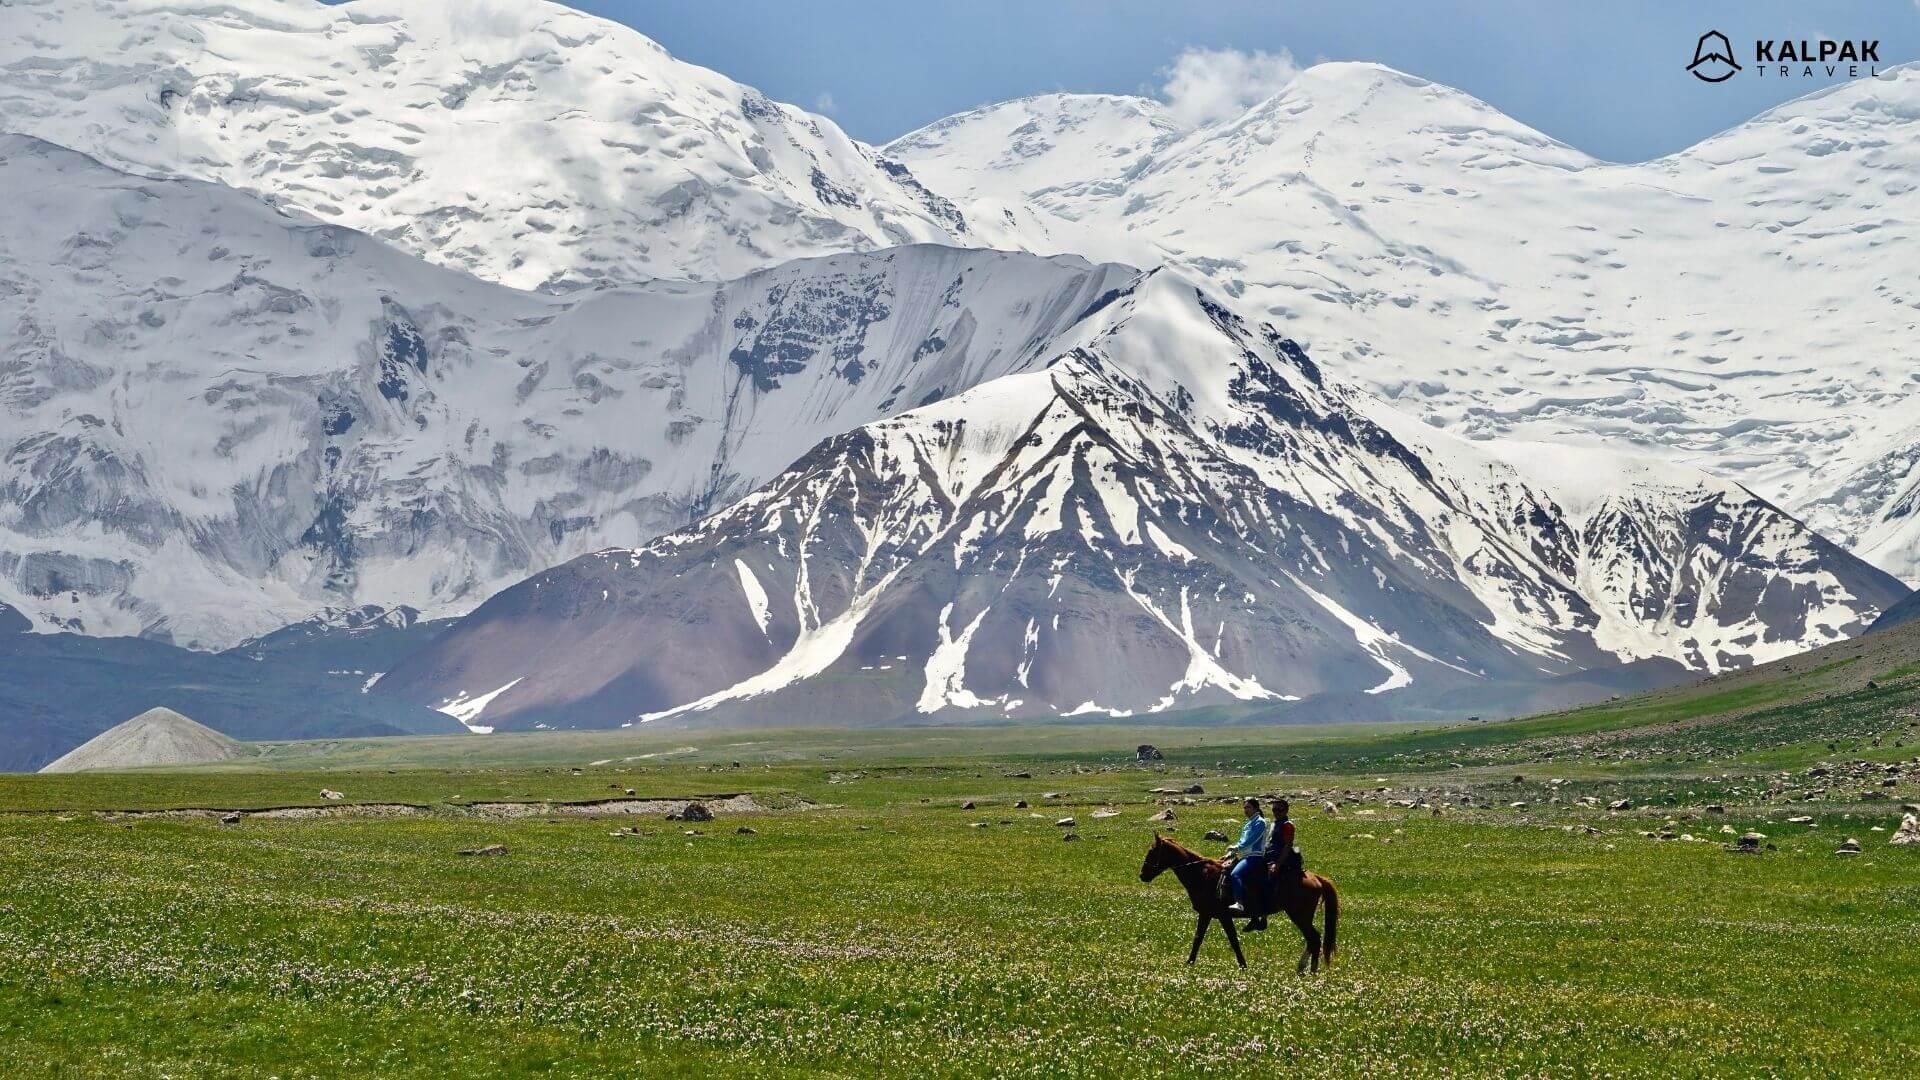 Kyrgyzstan mountains of Peak Lenin